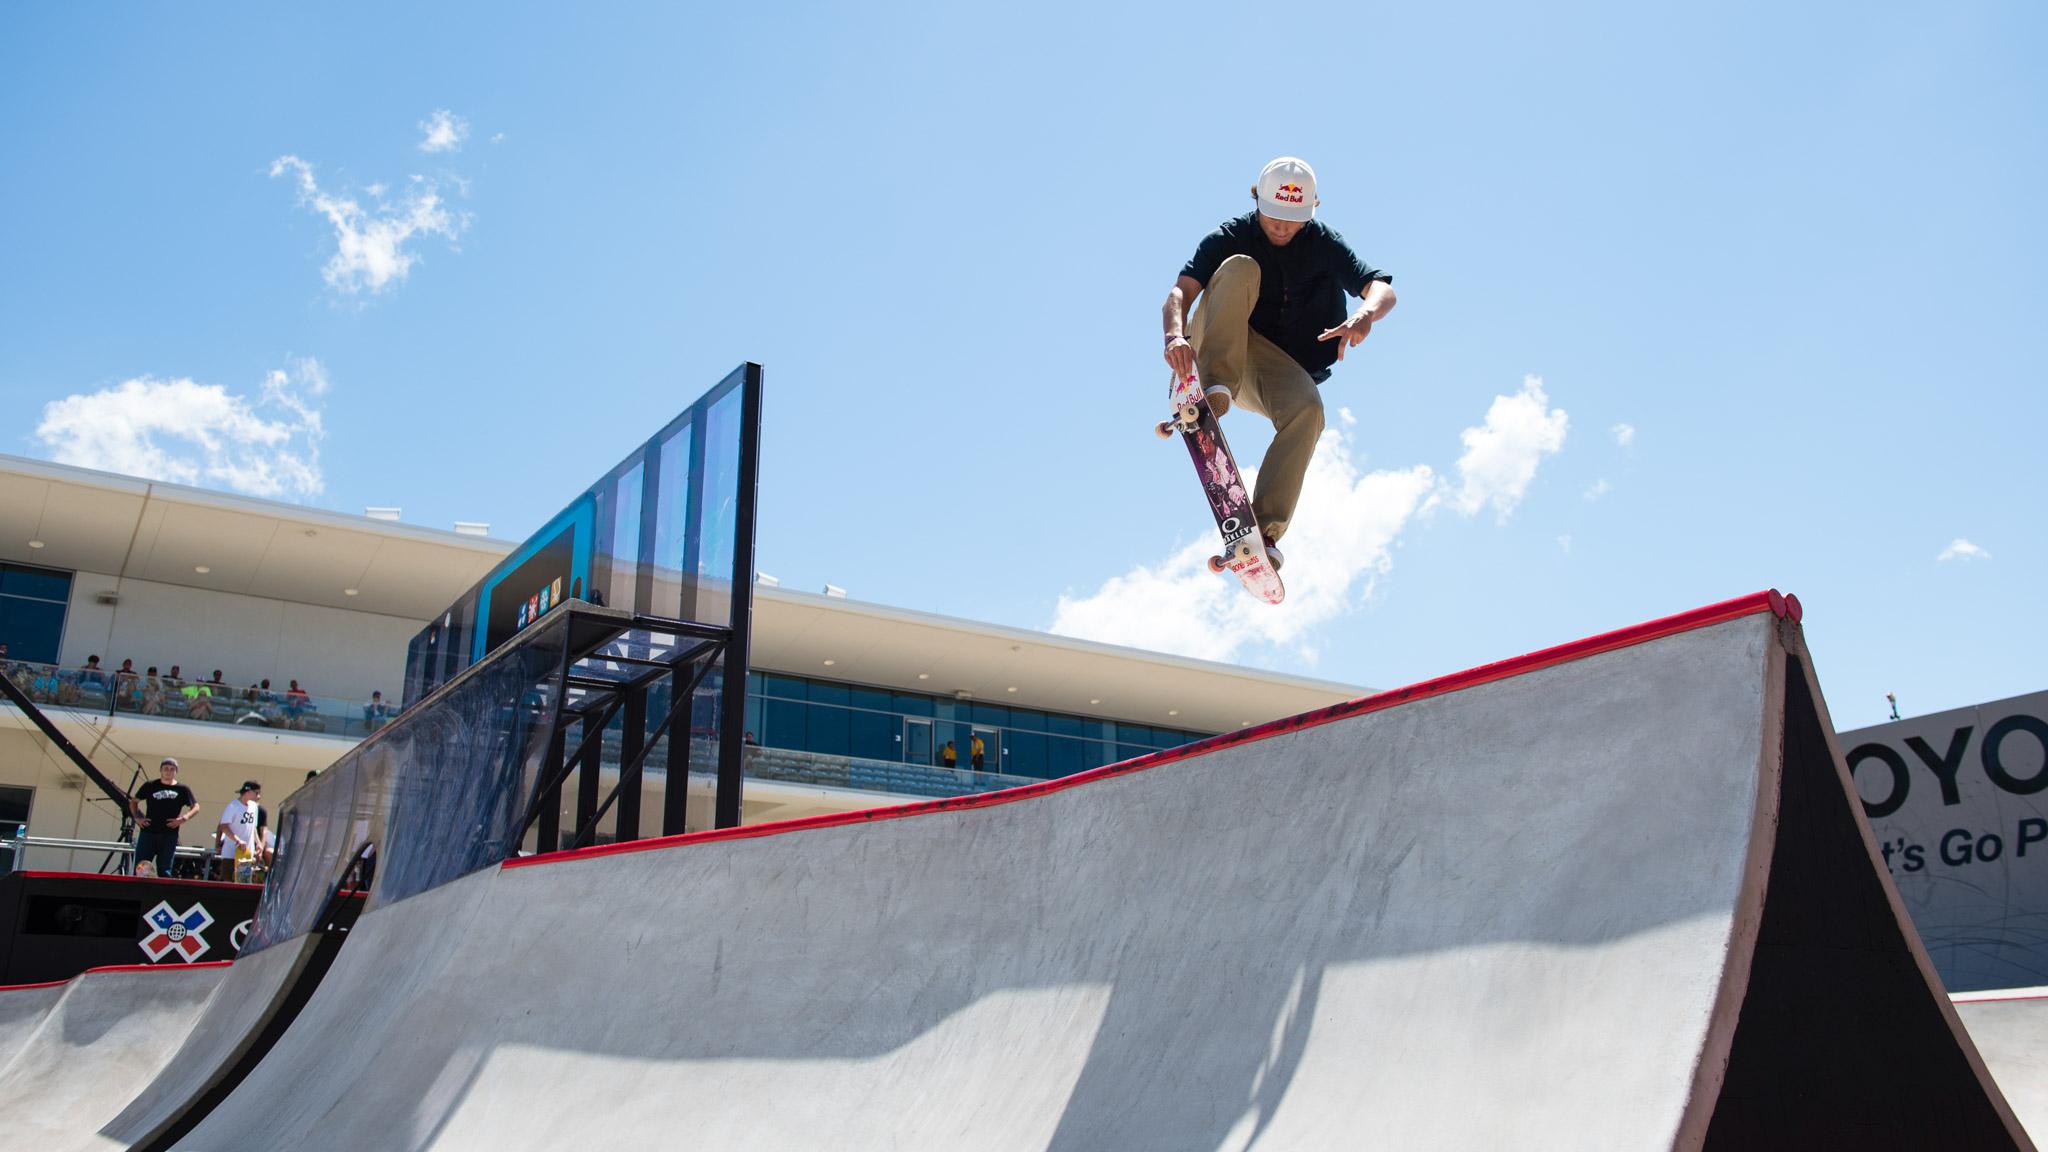 Skateboarding: Alex Sorgente